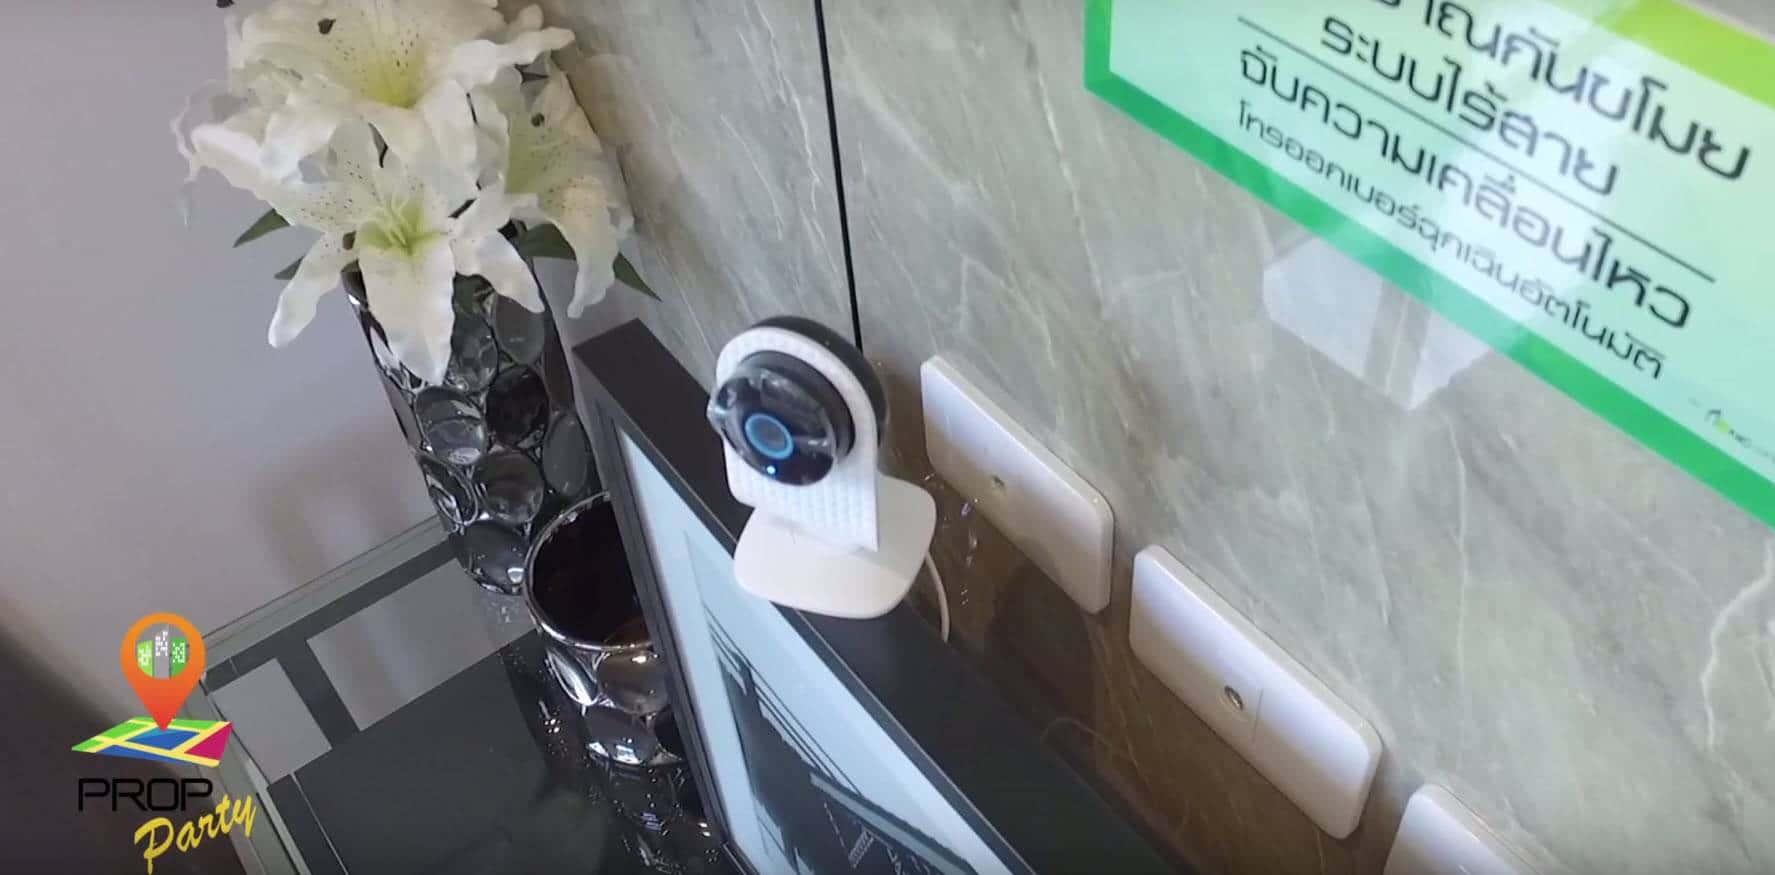 IOT ระบบ Smart Home ตอบโจทย์ไลฟ์สไตล์ของคนรุ่นใหม่ จาก NC Housing | Prop2Morrow บ้าน คอนโด ข่าวอสังหาฯ